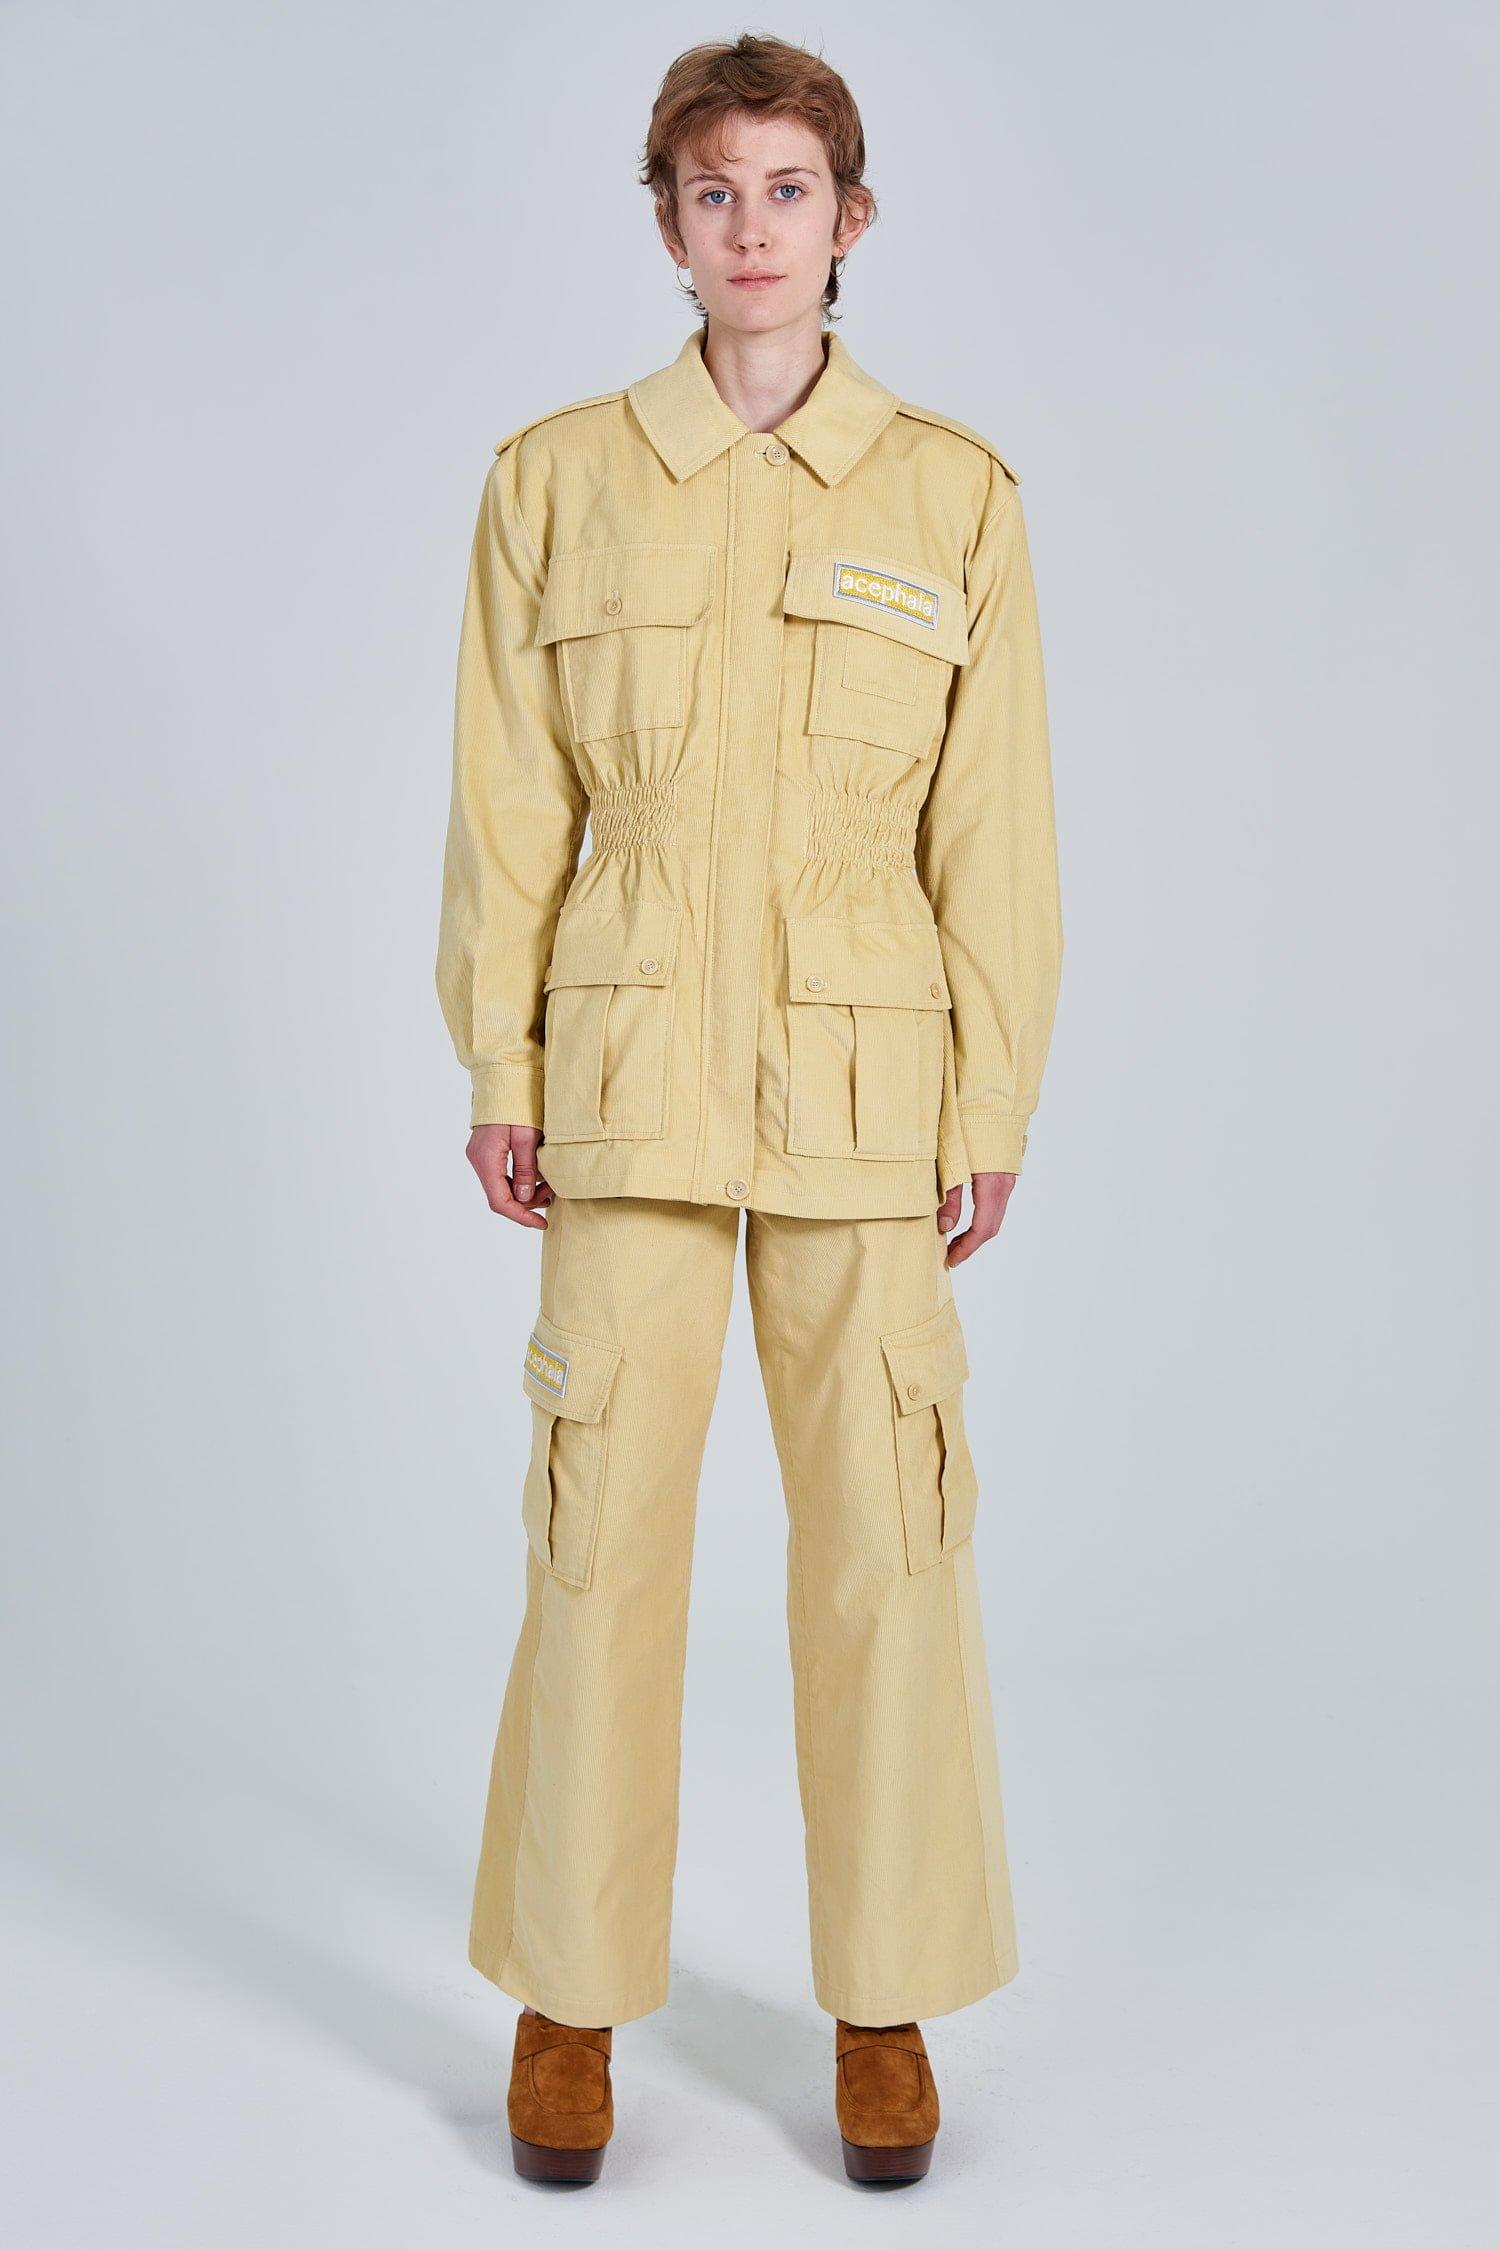 Acephala Fw 2020 21 Yellow Corduroy Trousers Jacket Female Front